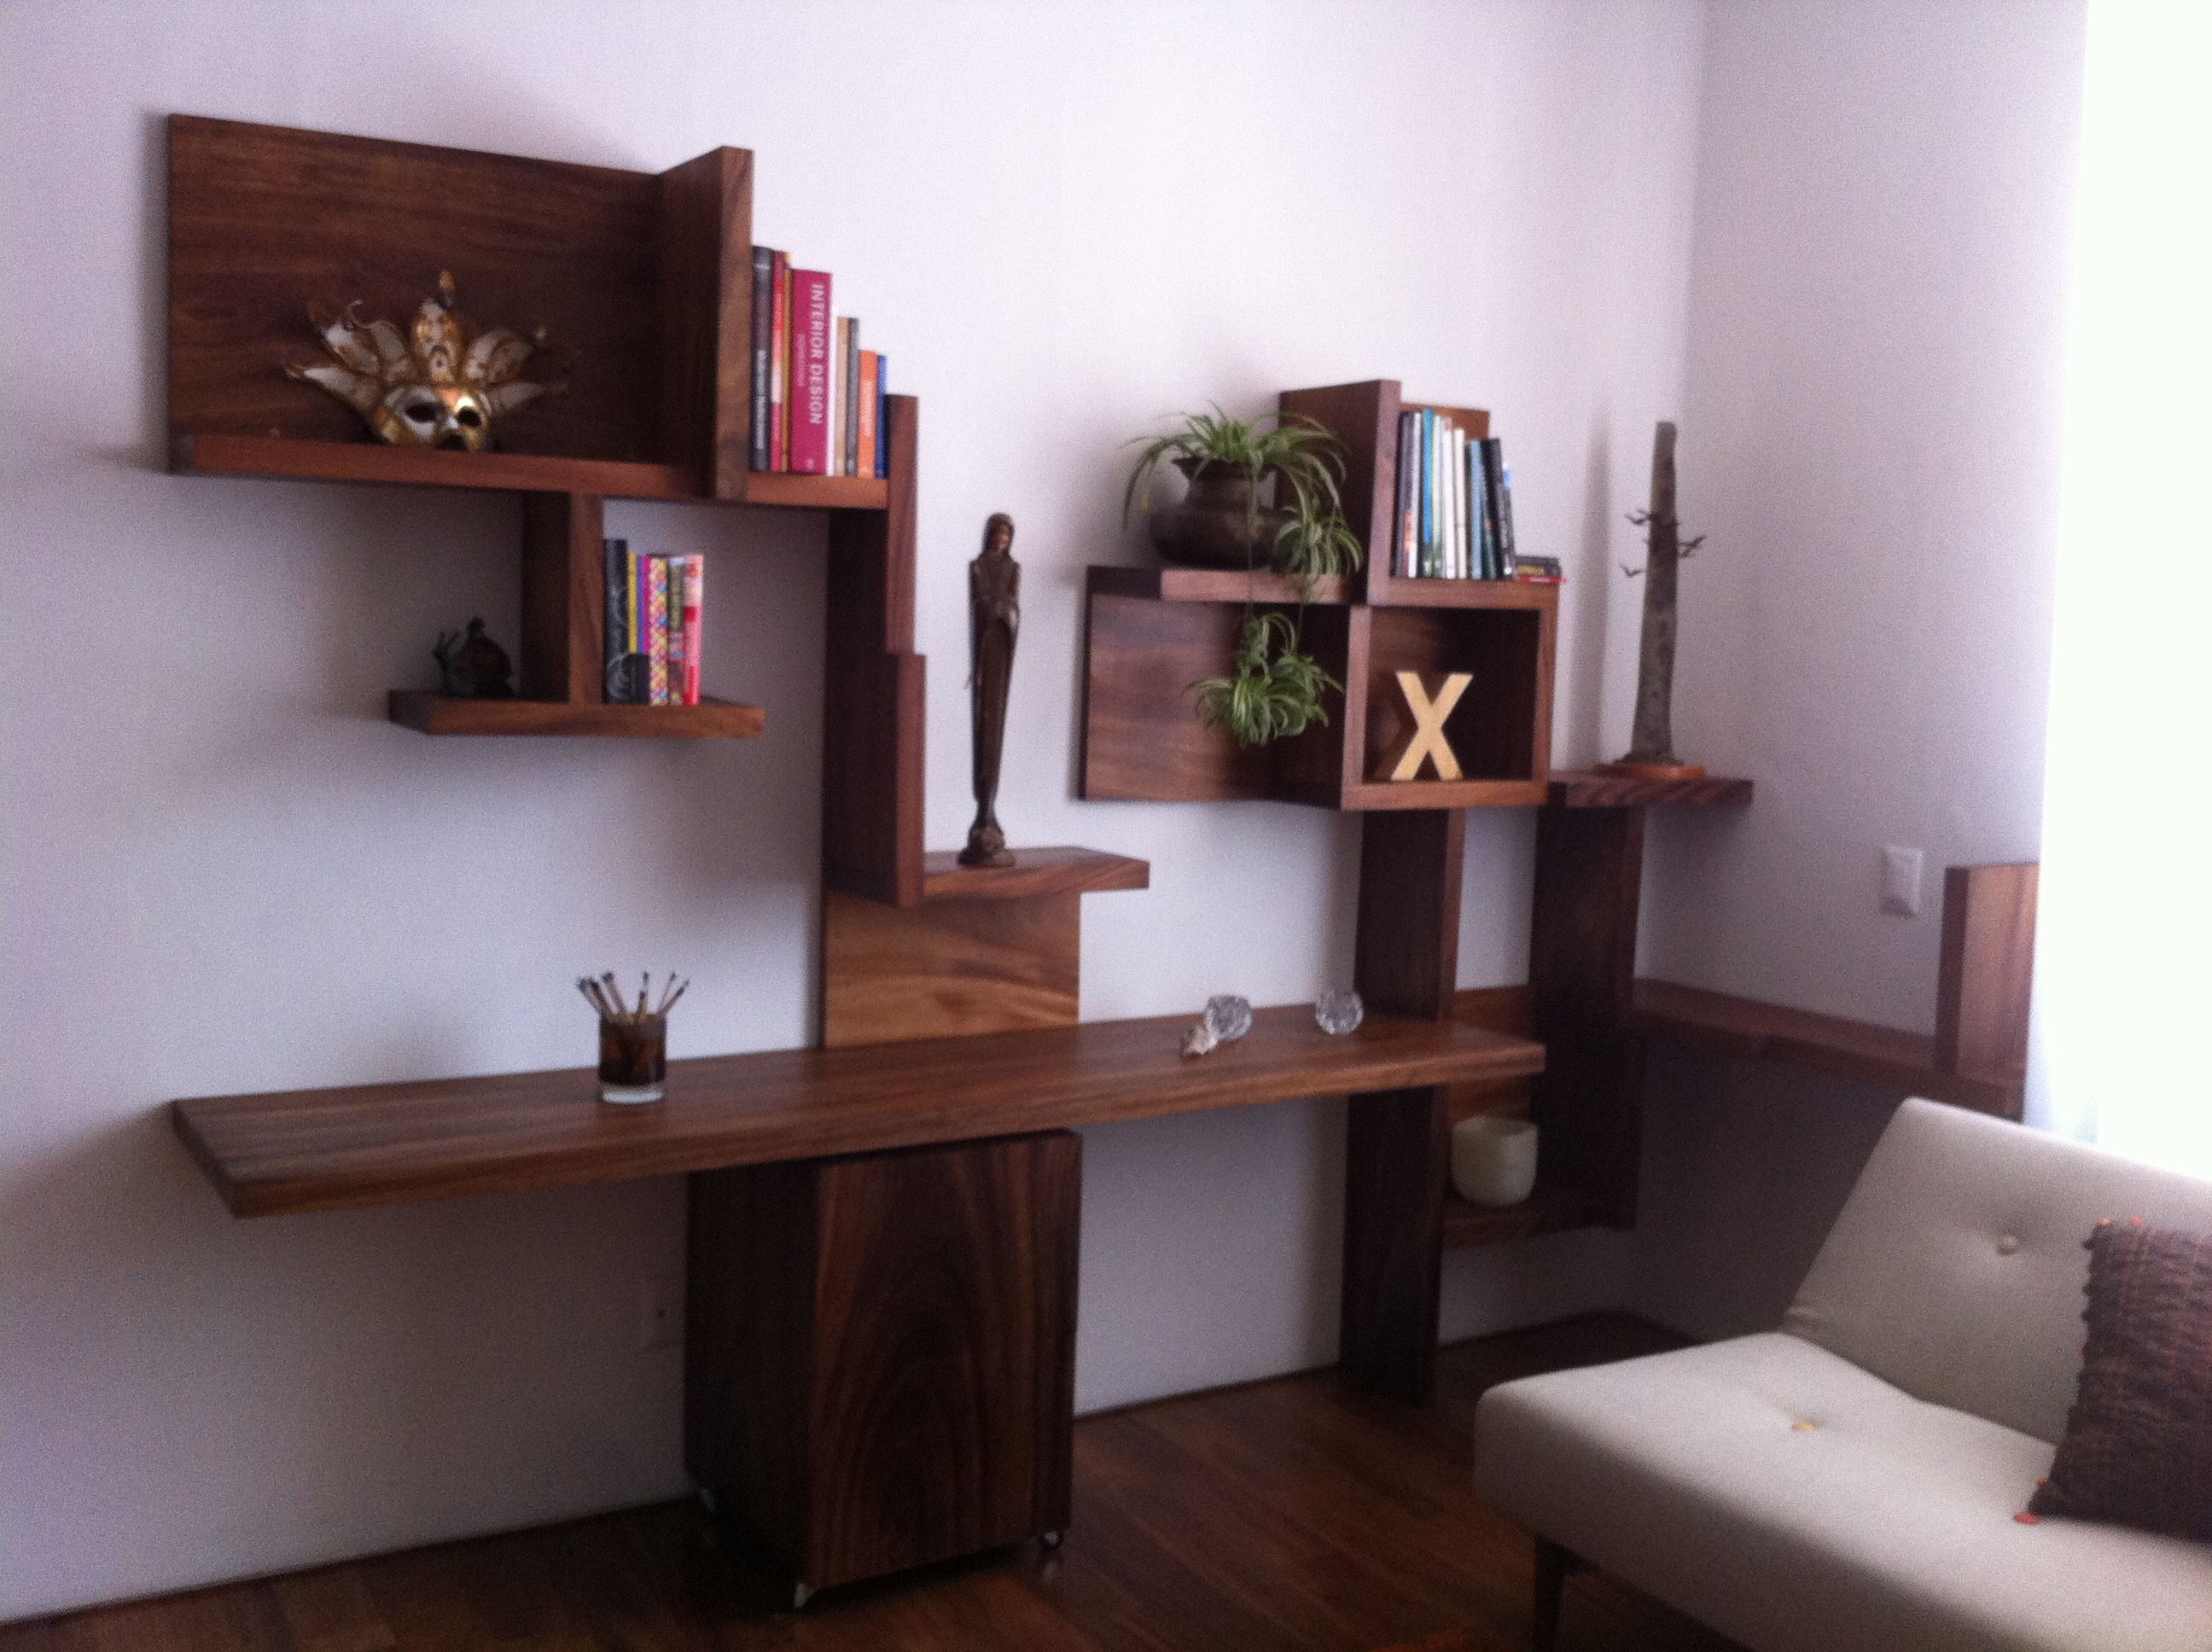 transmuta, guadalajara, muebles de madera, arquitectura, diseño ...